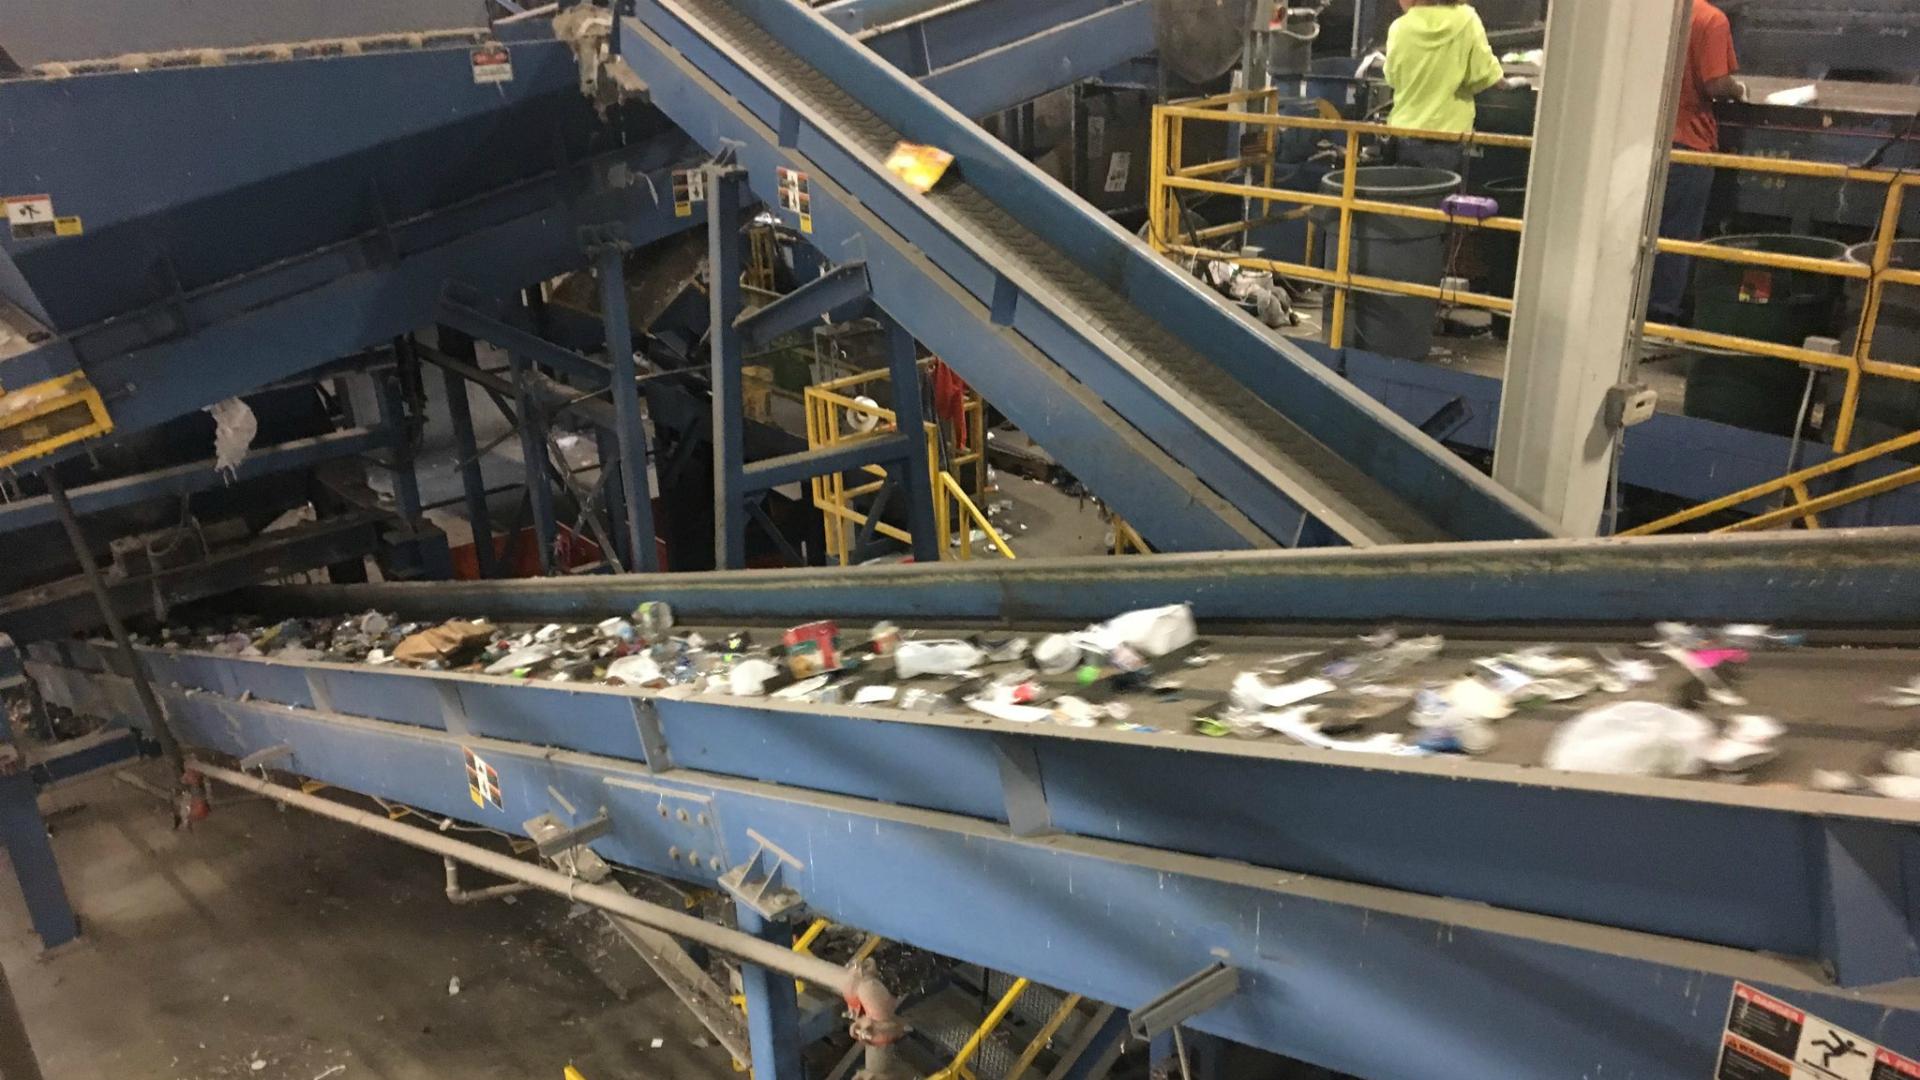 kent county recycling center 061118_1528746753162.jpg.jpg